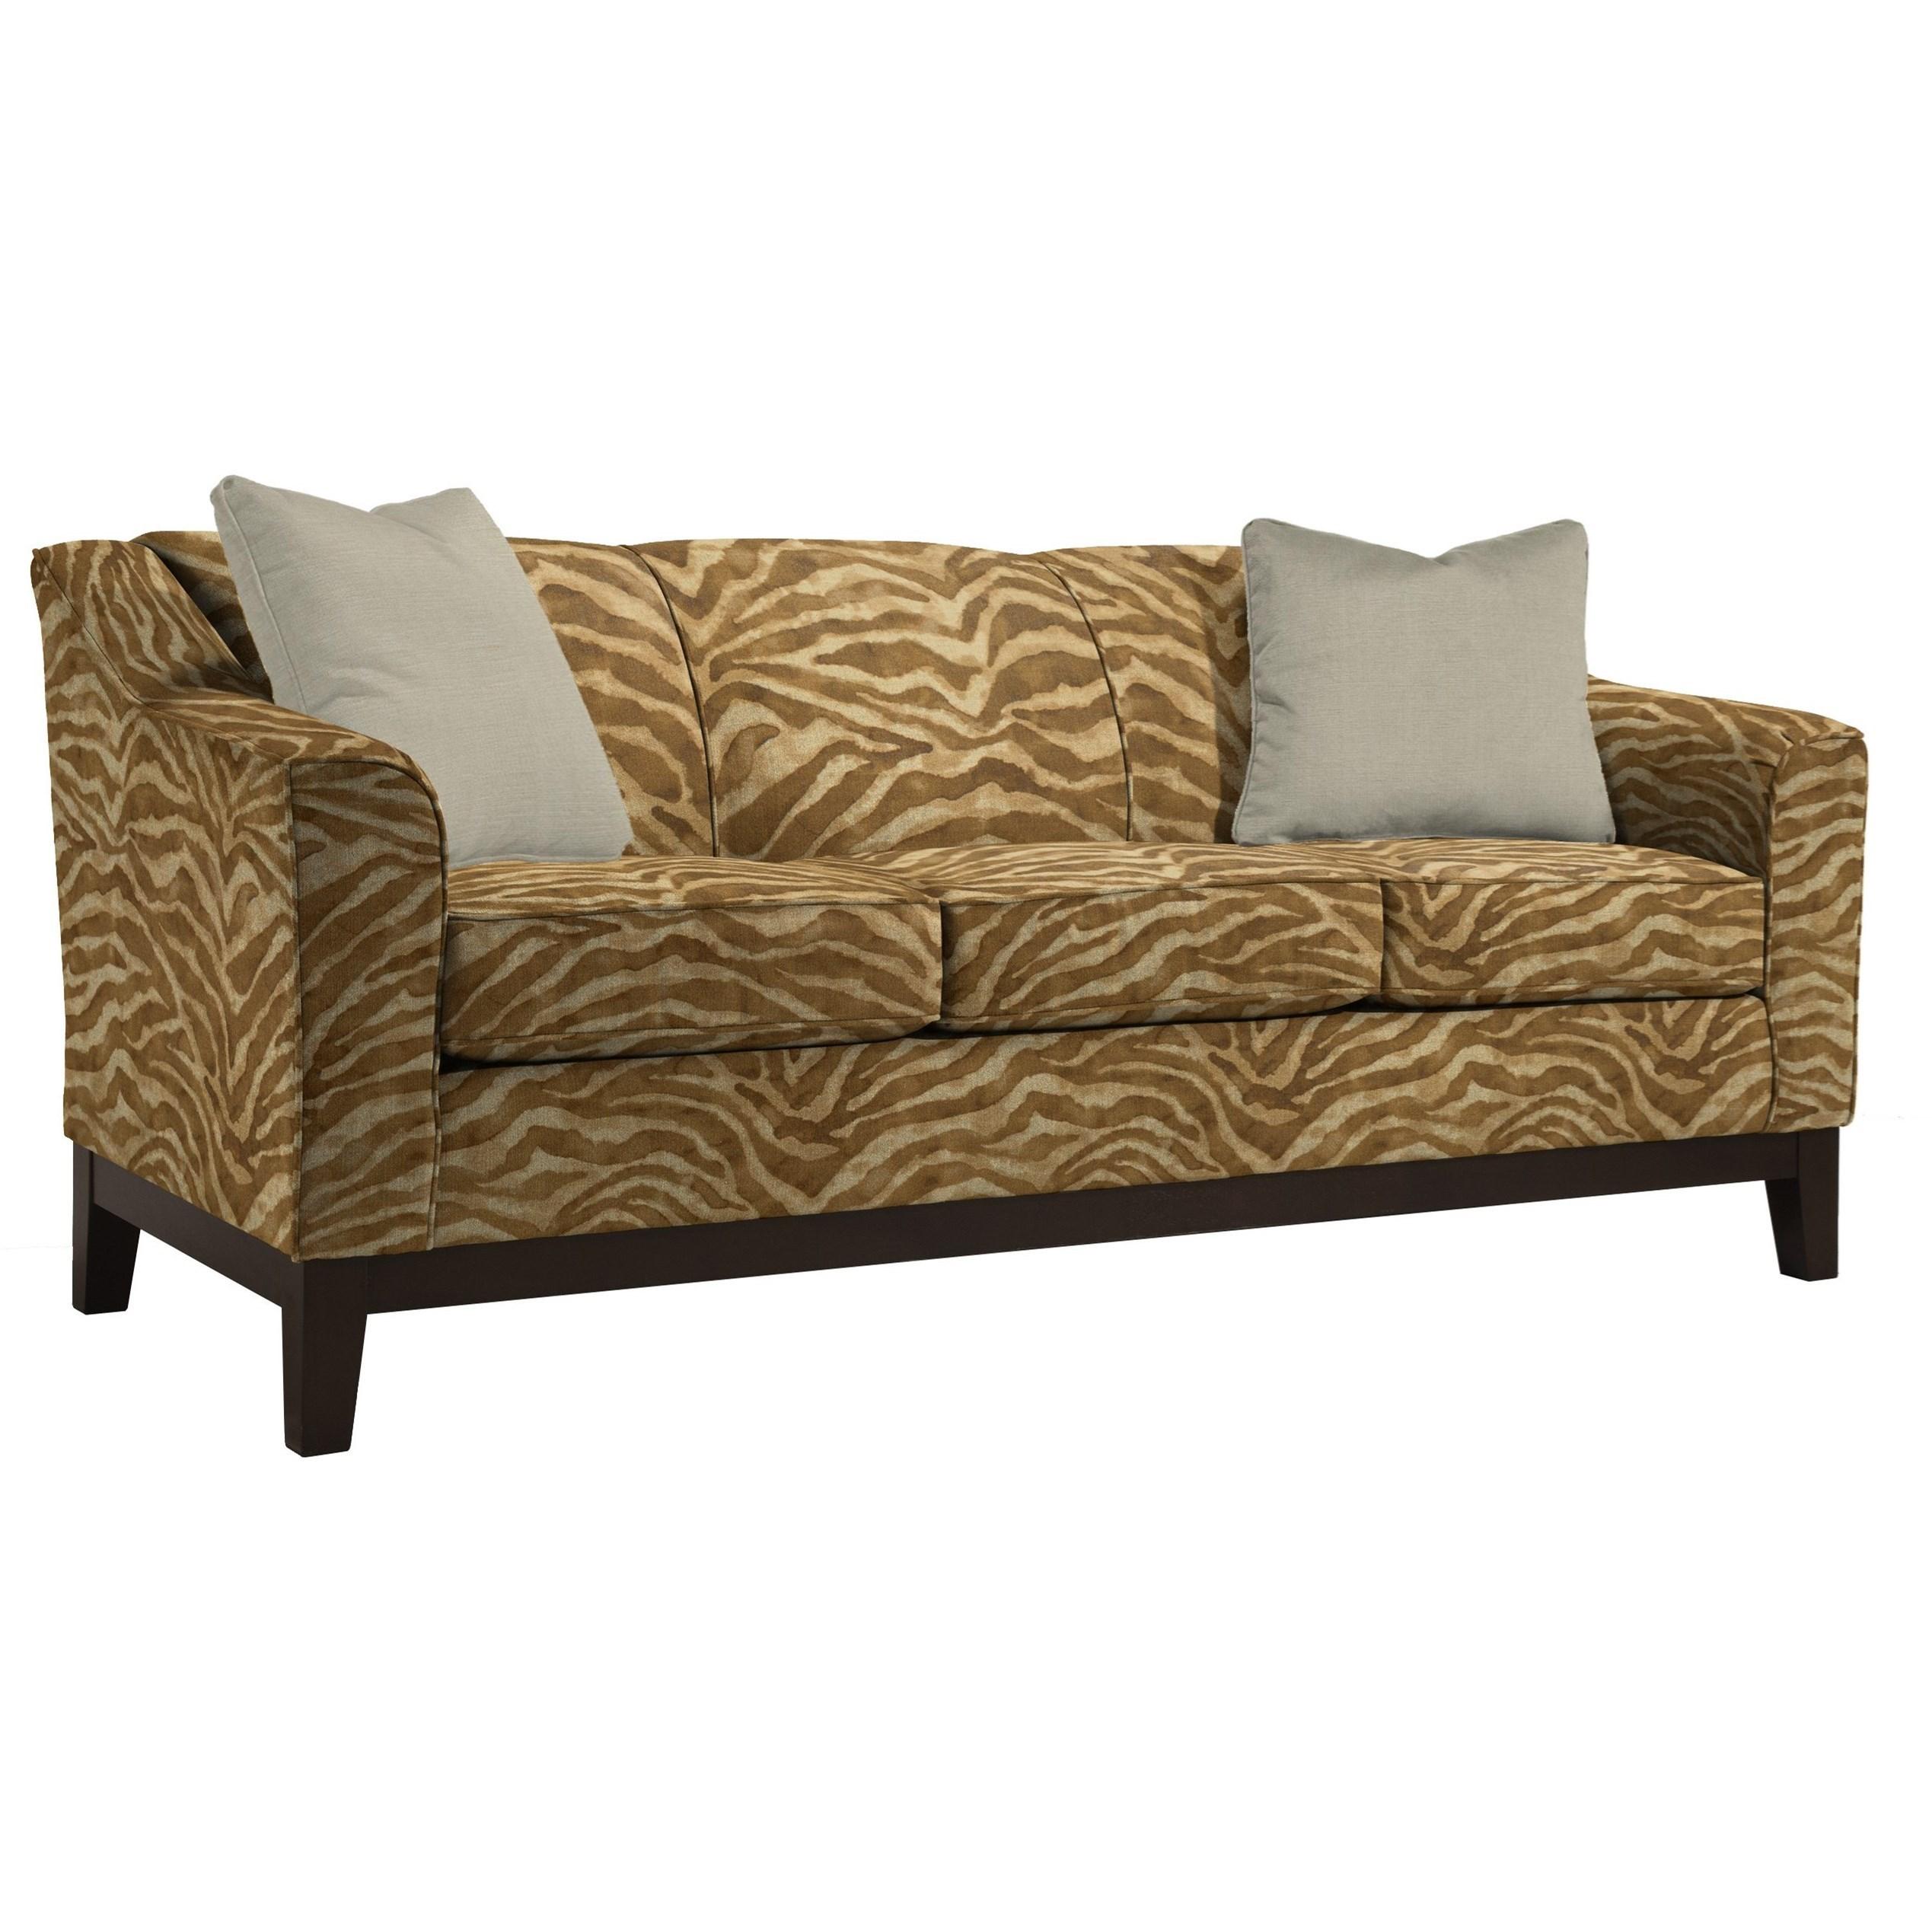 Best Home Furnishings Emeline Customizable Sofa - Item Number: 206338137-35816